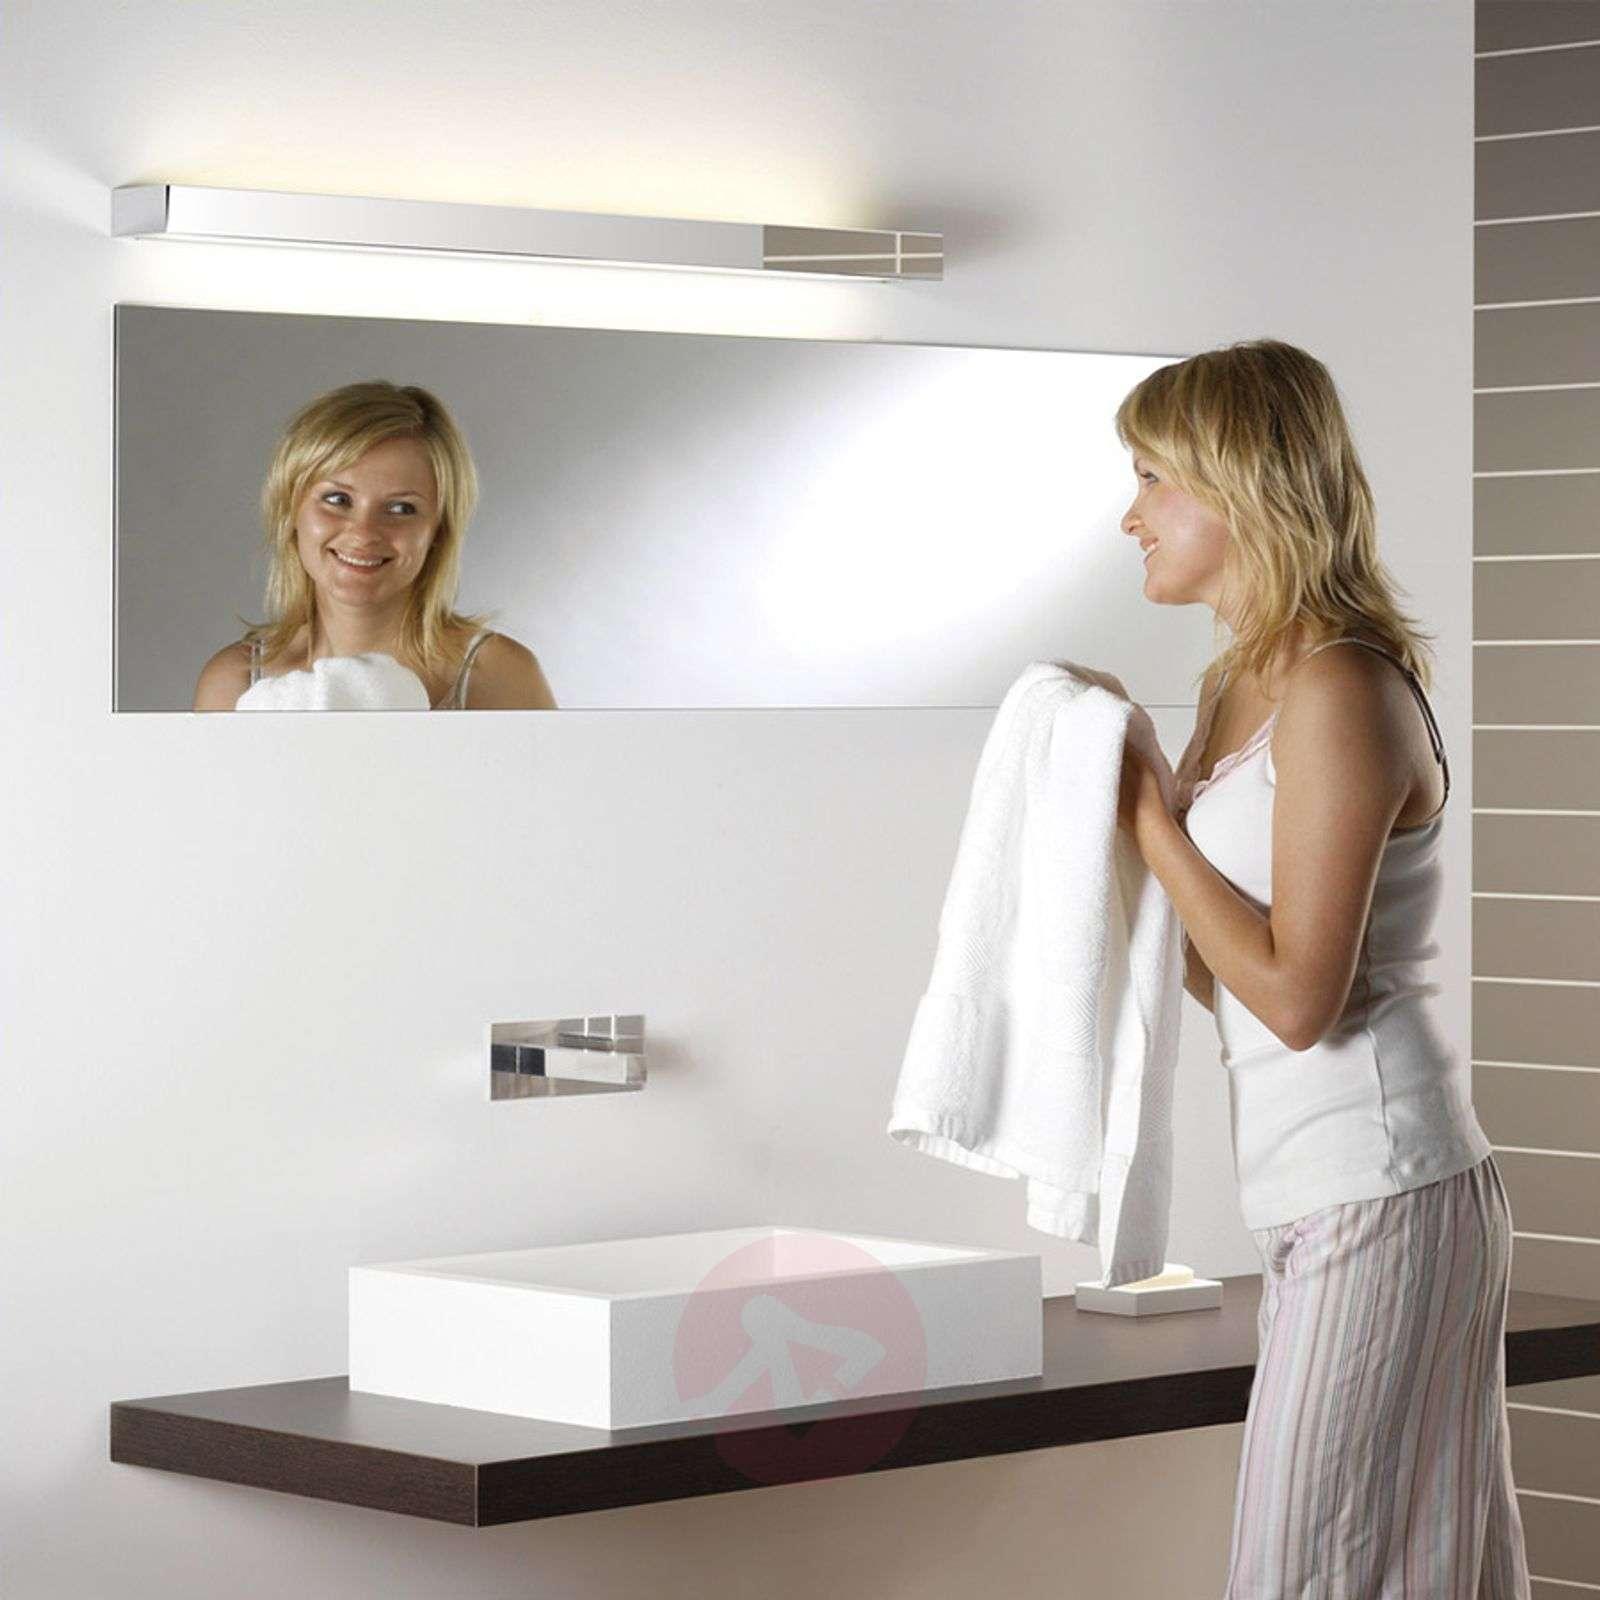 Tallin 1200 Bathroom Wall Light Elegant Chrome-1020370-02